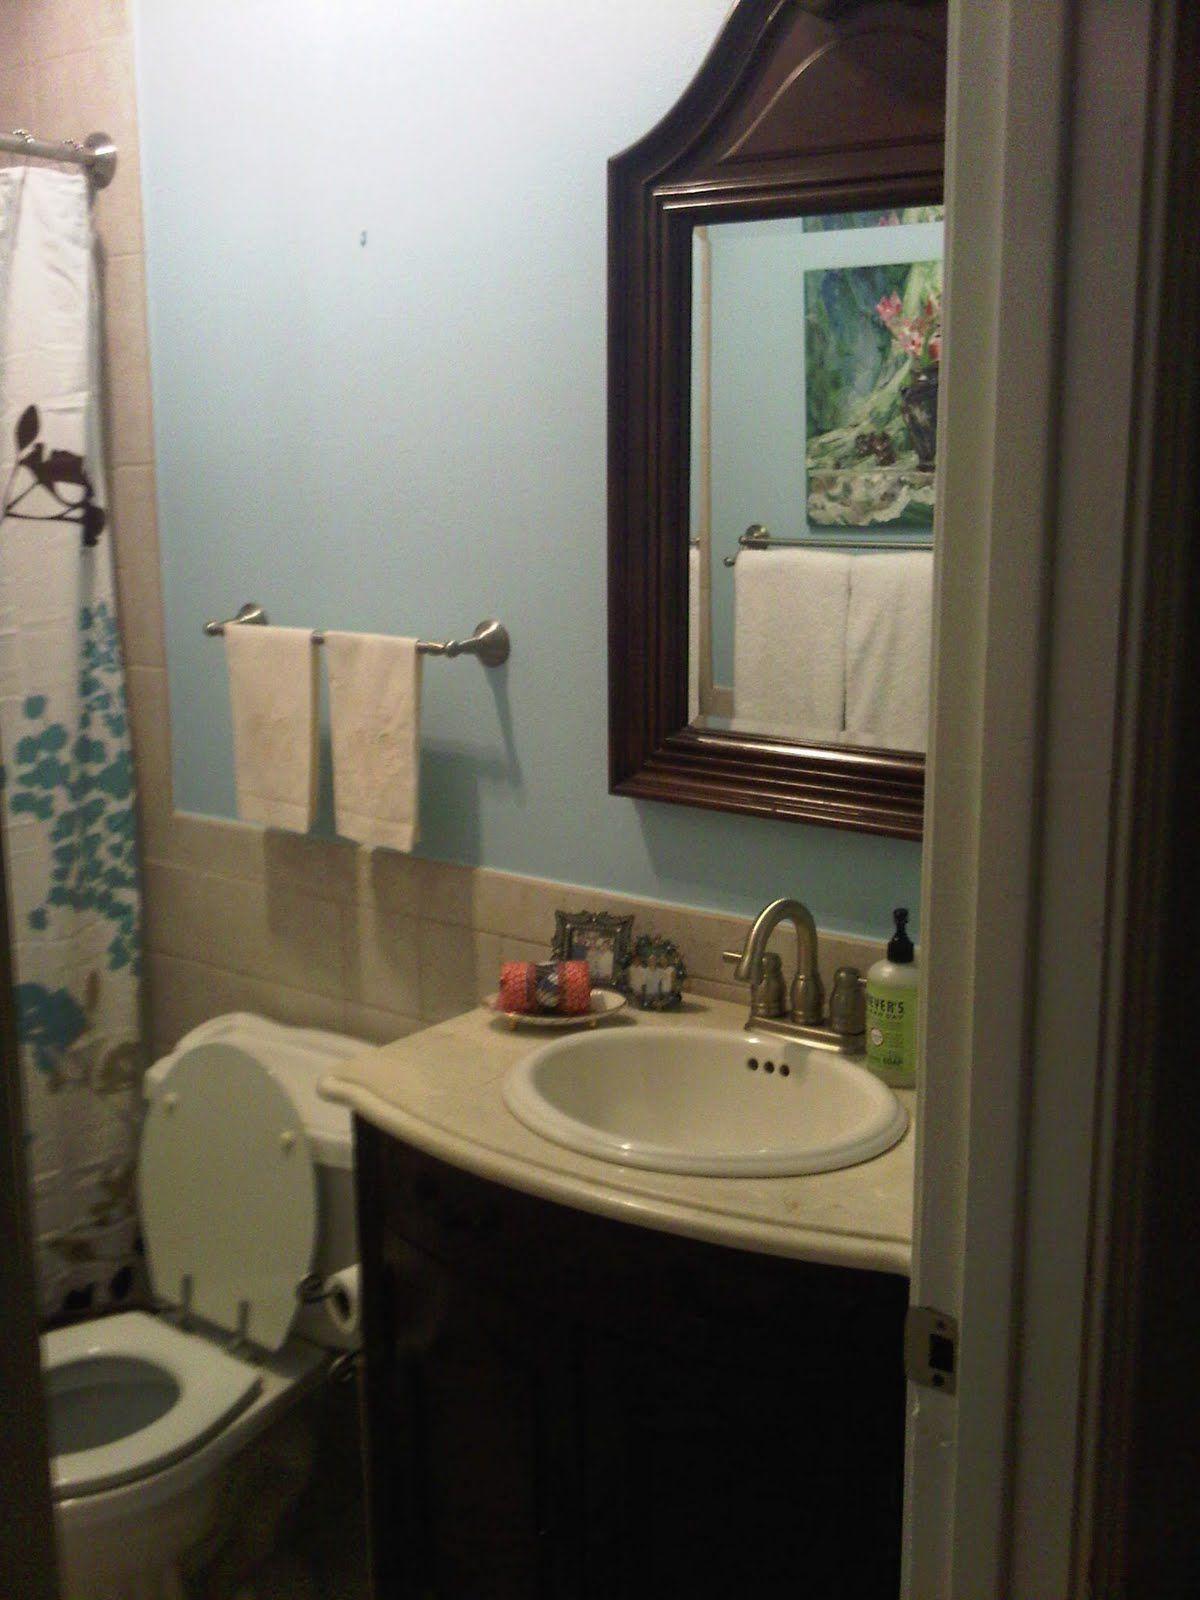 small bathroom no window paint color google search on best paint colors for bathroom with no windows id=86220